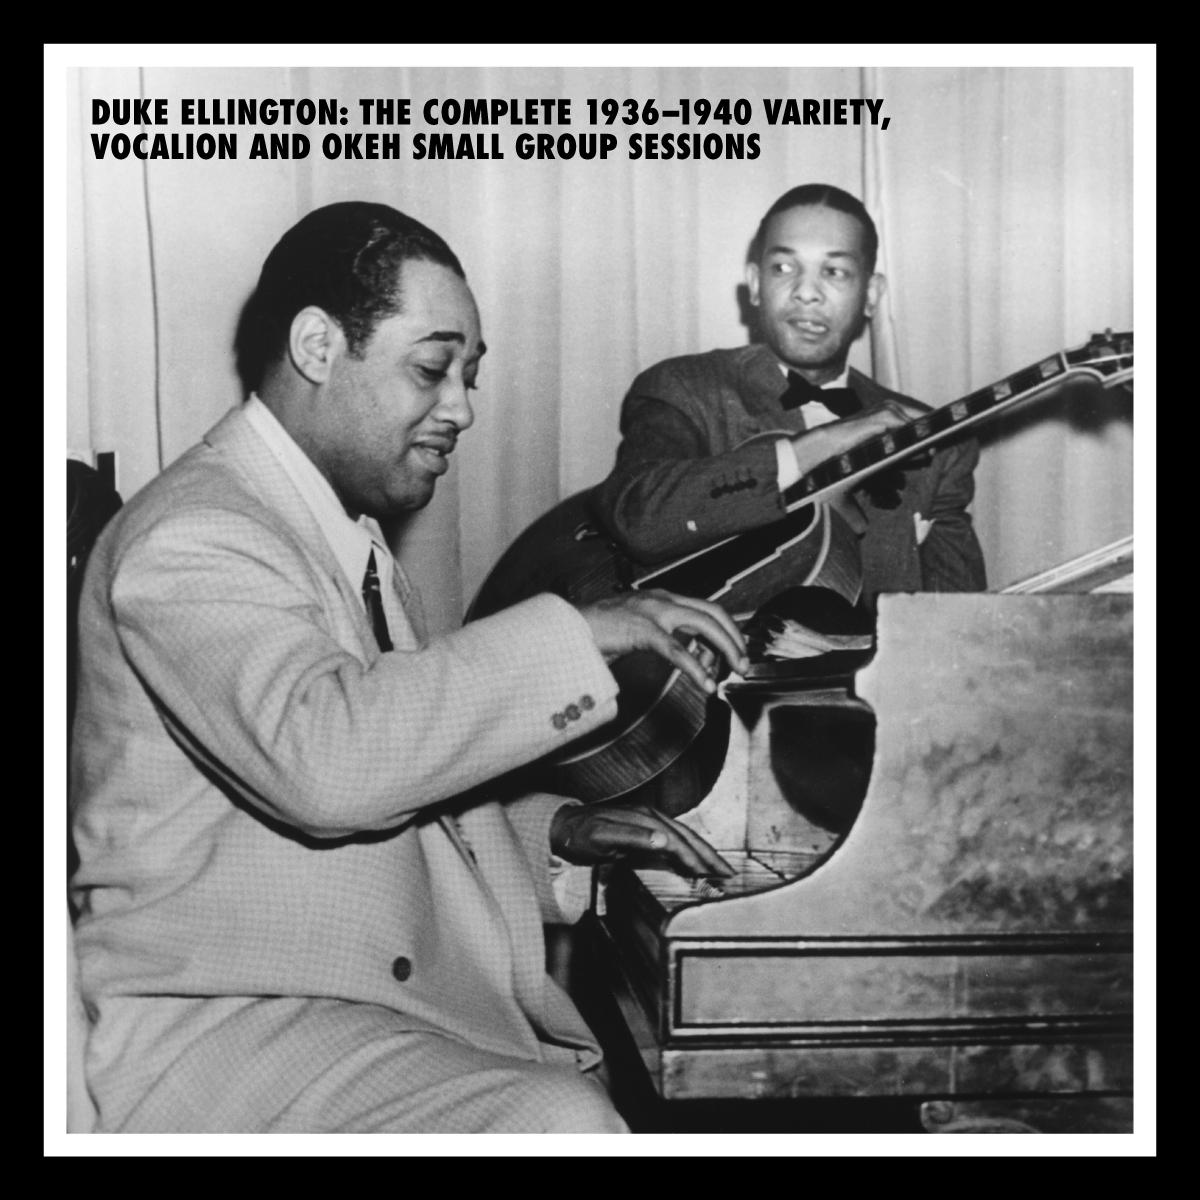 Duke Ellington: The Complete 1936-1940 Variety, Vocaliaon & OKeh Small Group Recordings (7 CDs)